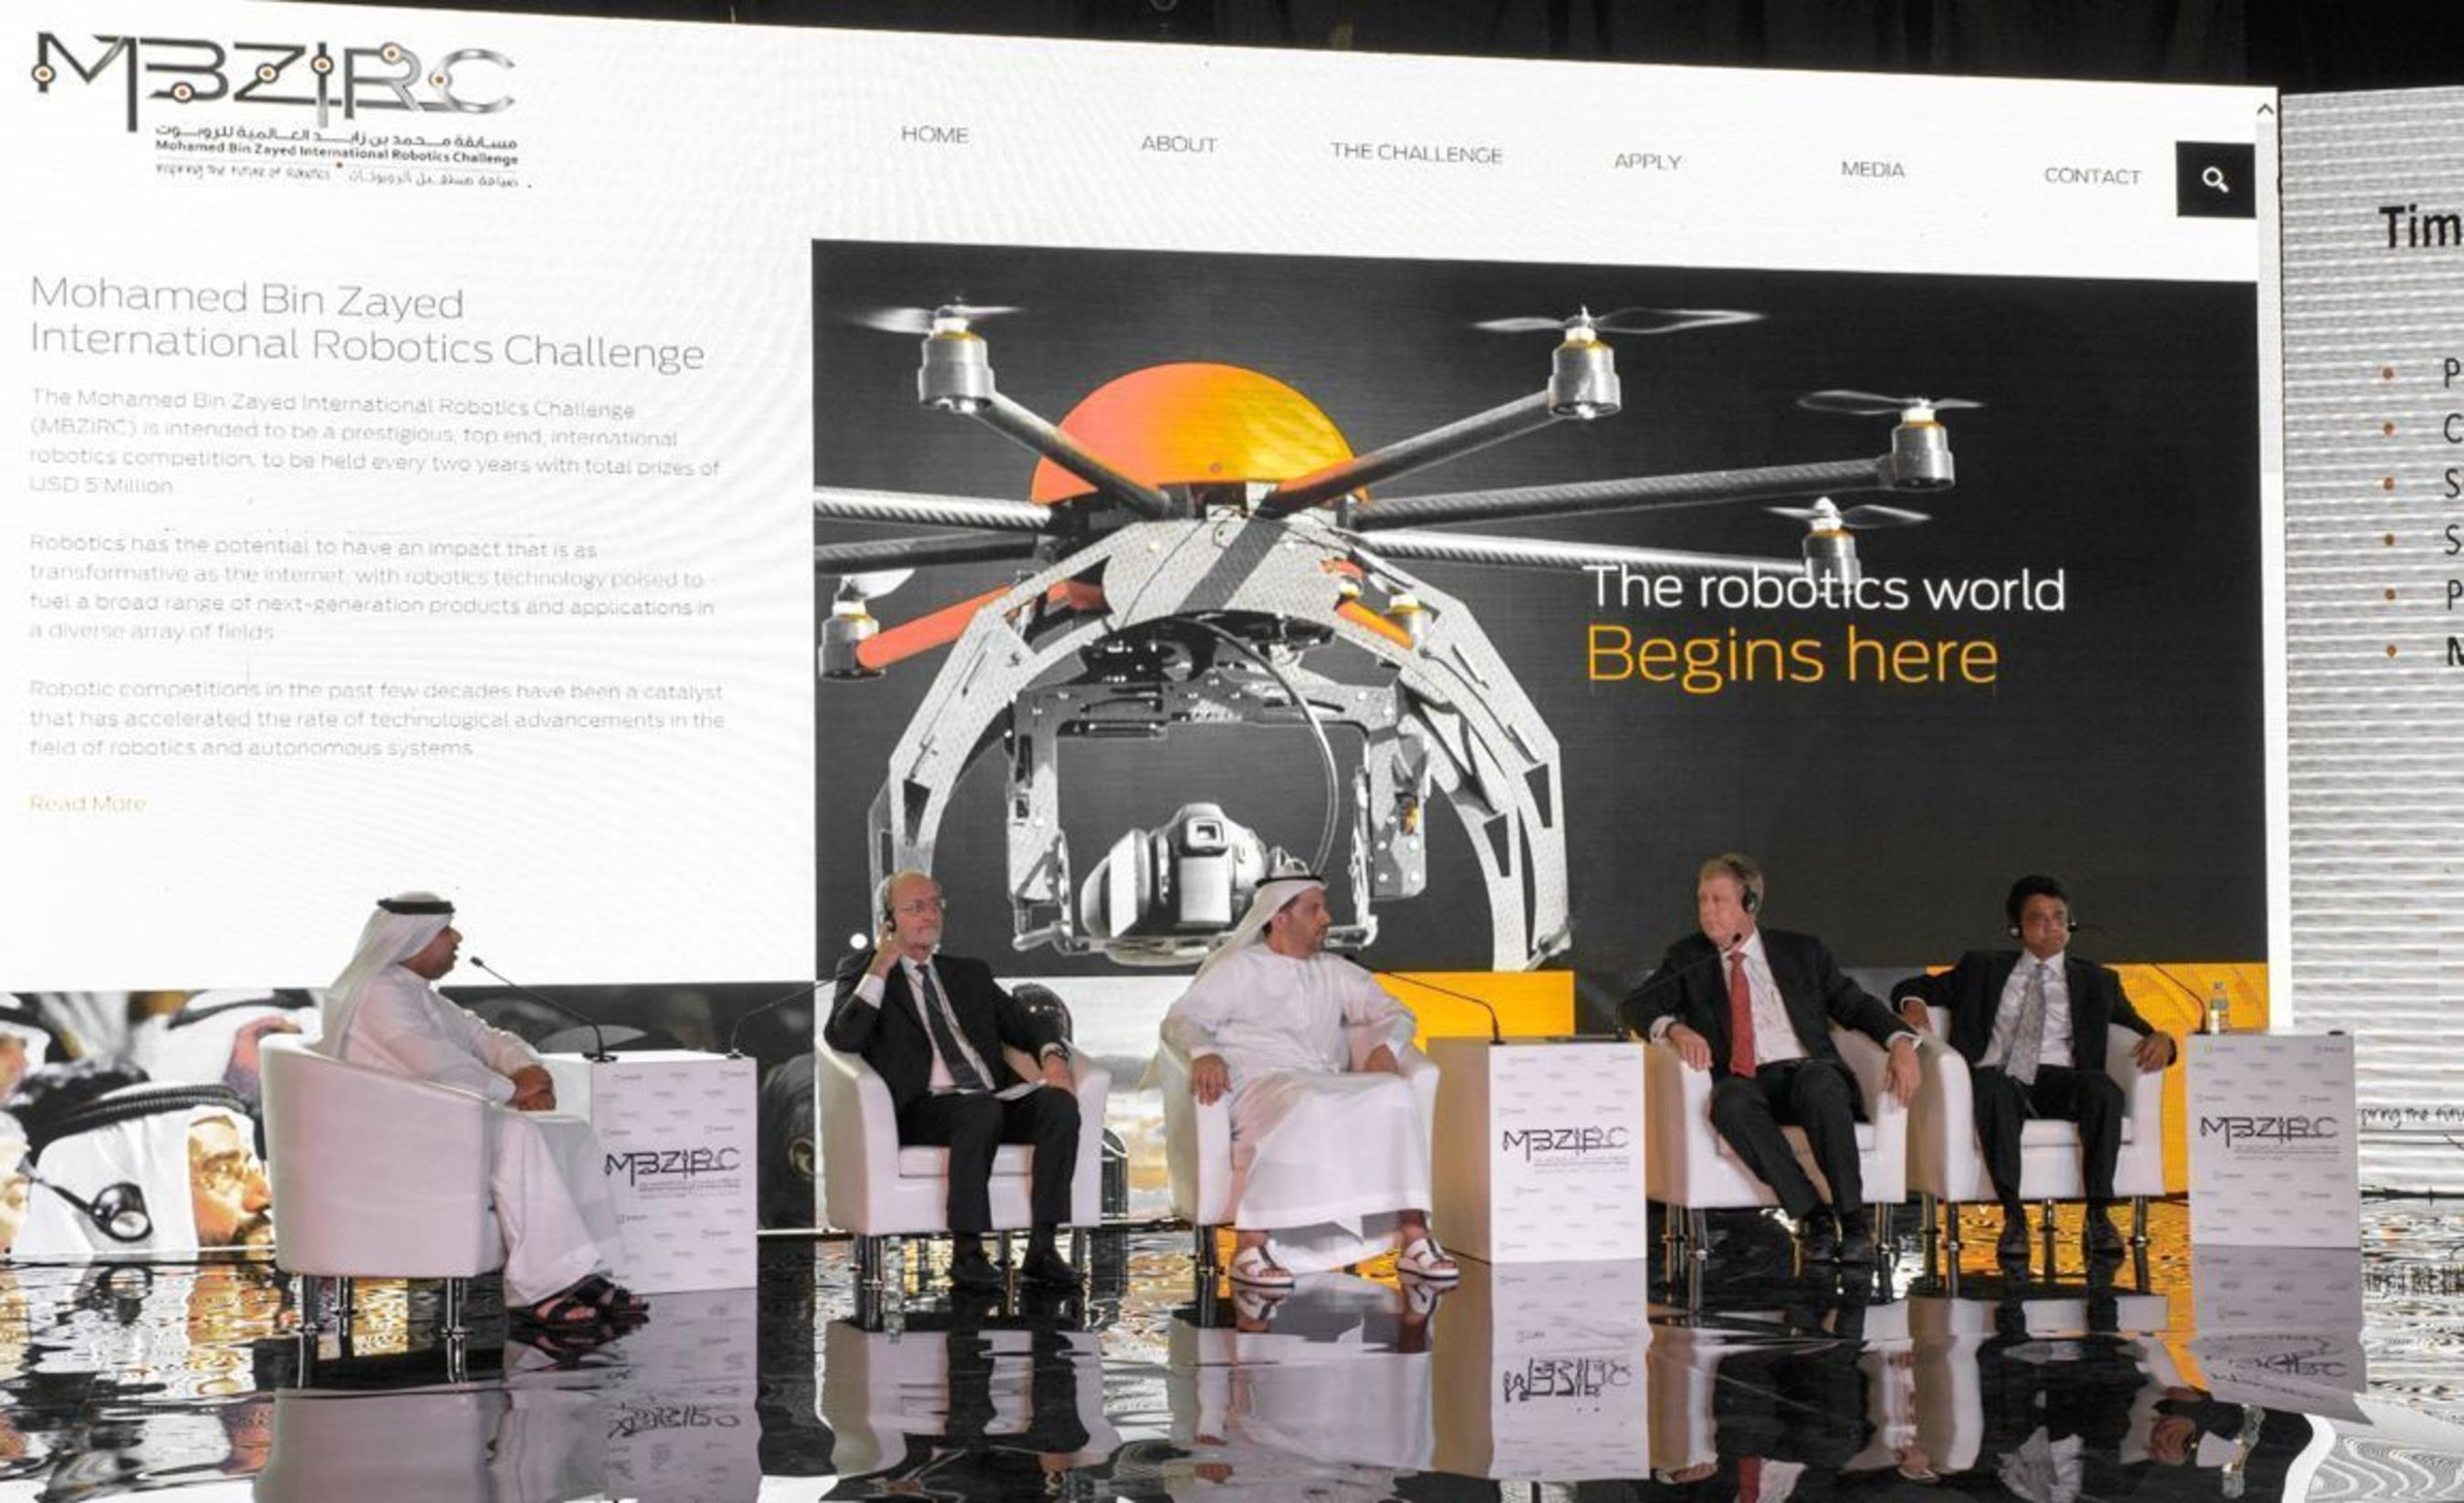 El Mohamed Bin Zayed International Robotics Challenge da a conocer detalles de la competencia